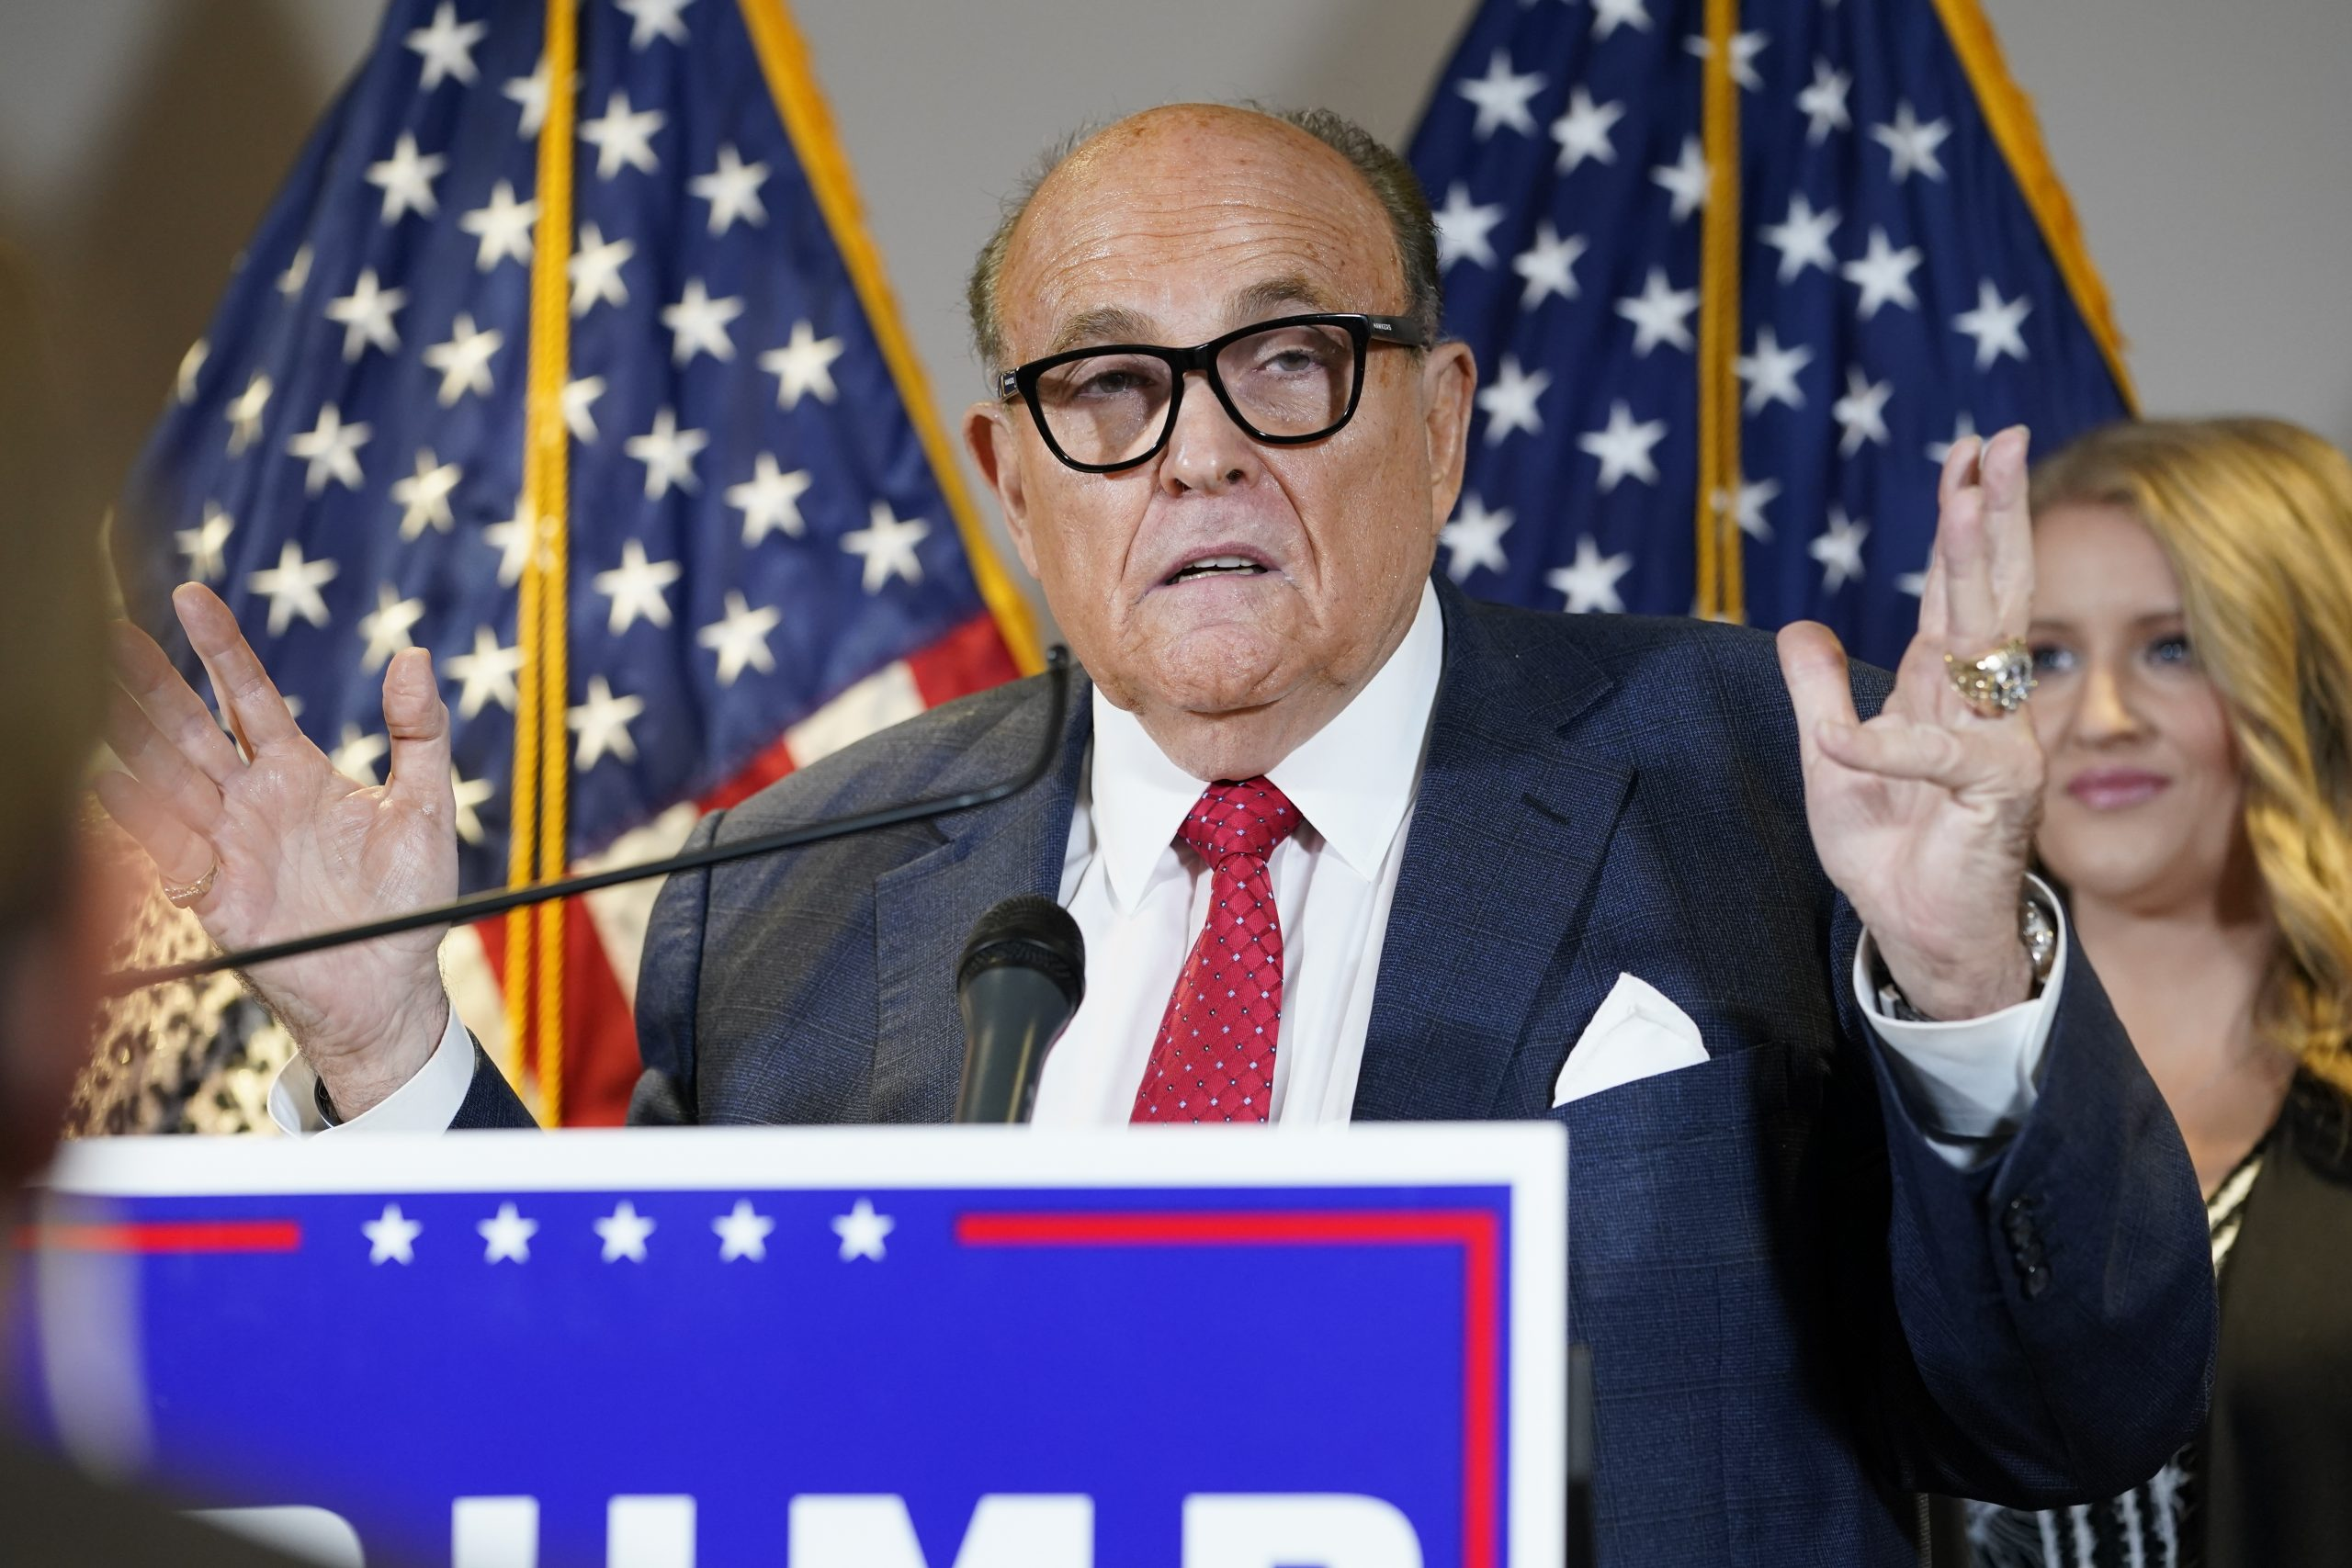 AP Photo of Rudy Giuliani